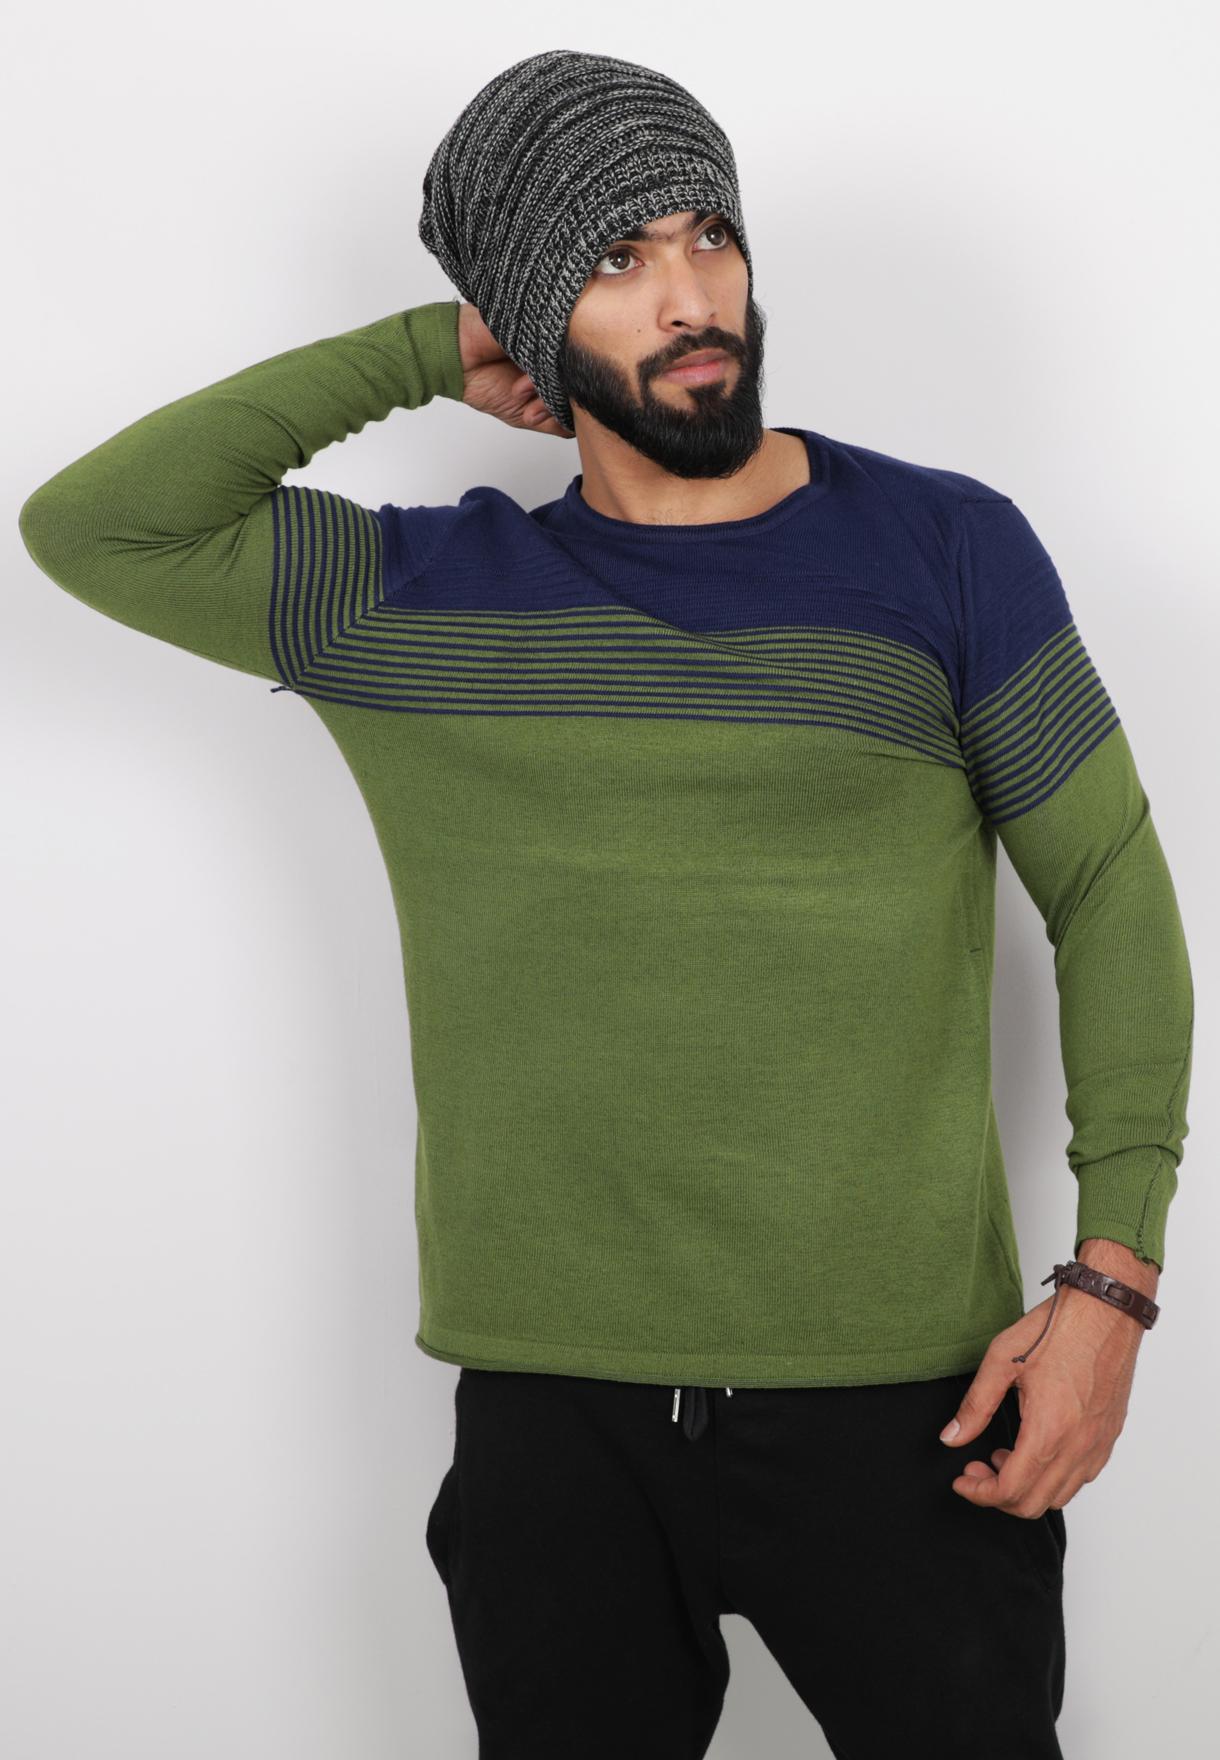 Score Jeans Tshirt Full Sleeve Green - RO4 - L